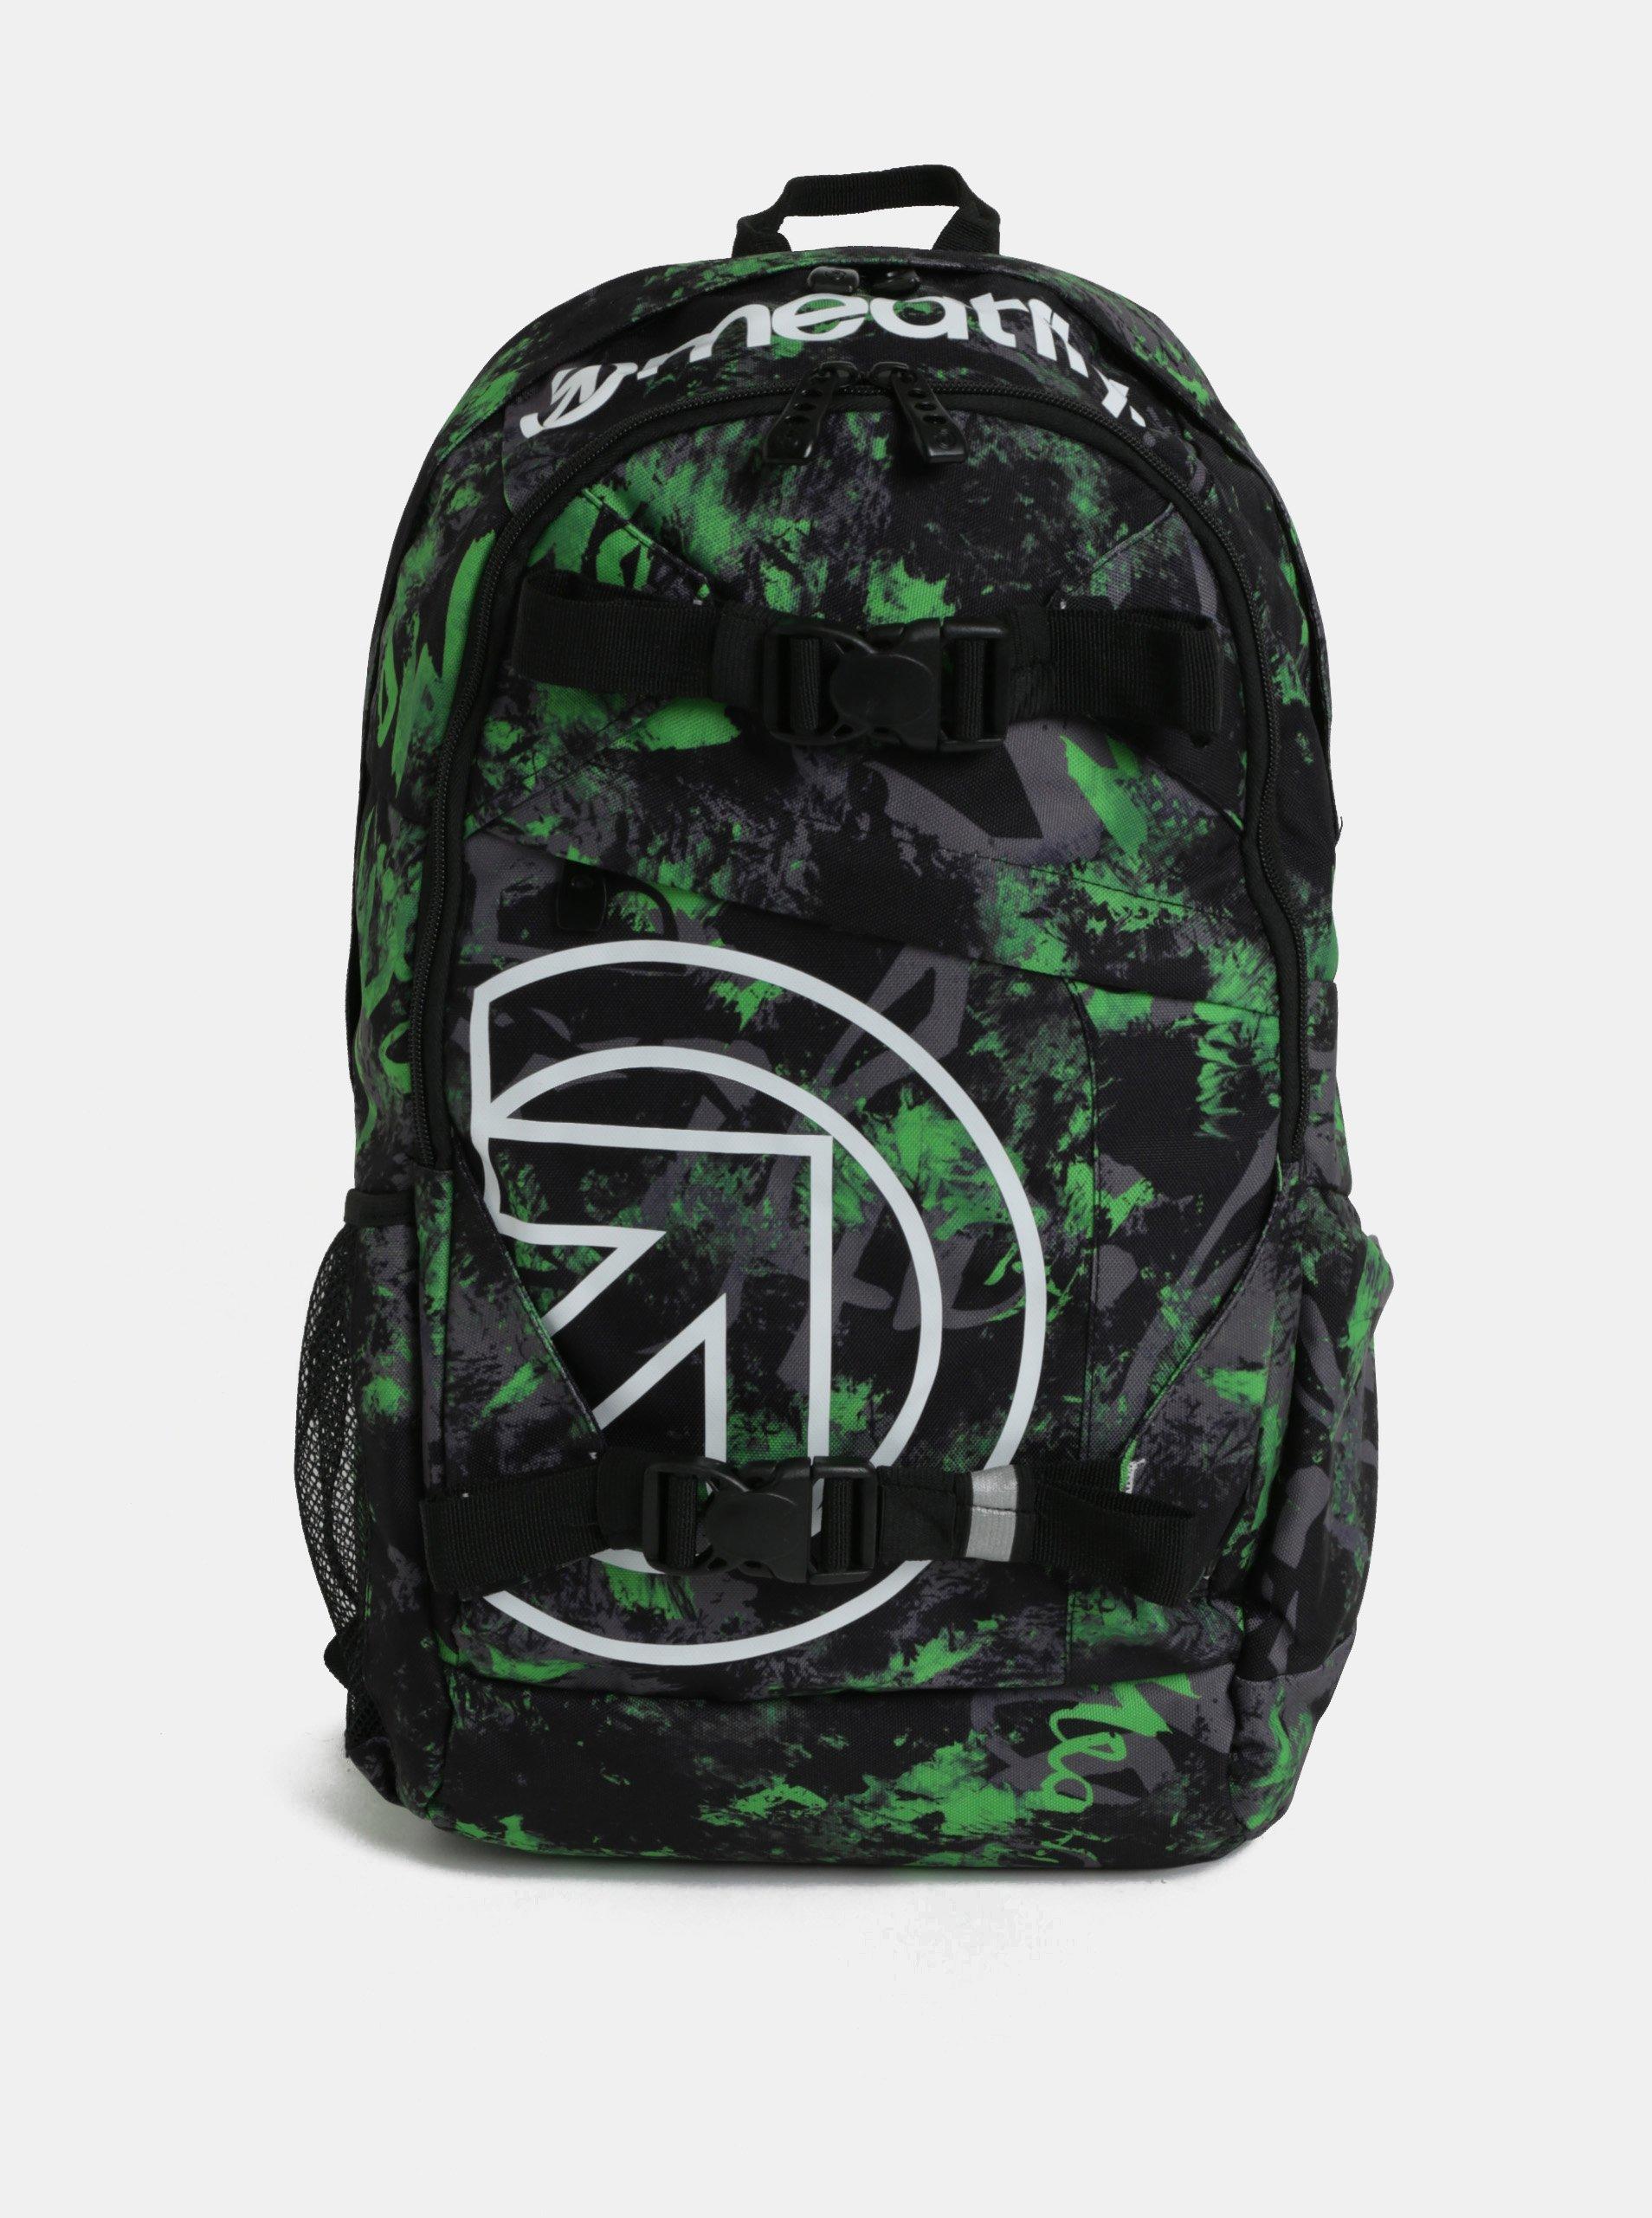 Zeleno-čierny pánsky kockovaný batoh Meatfly basejumper 3 20 l  ee6a3826cab